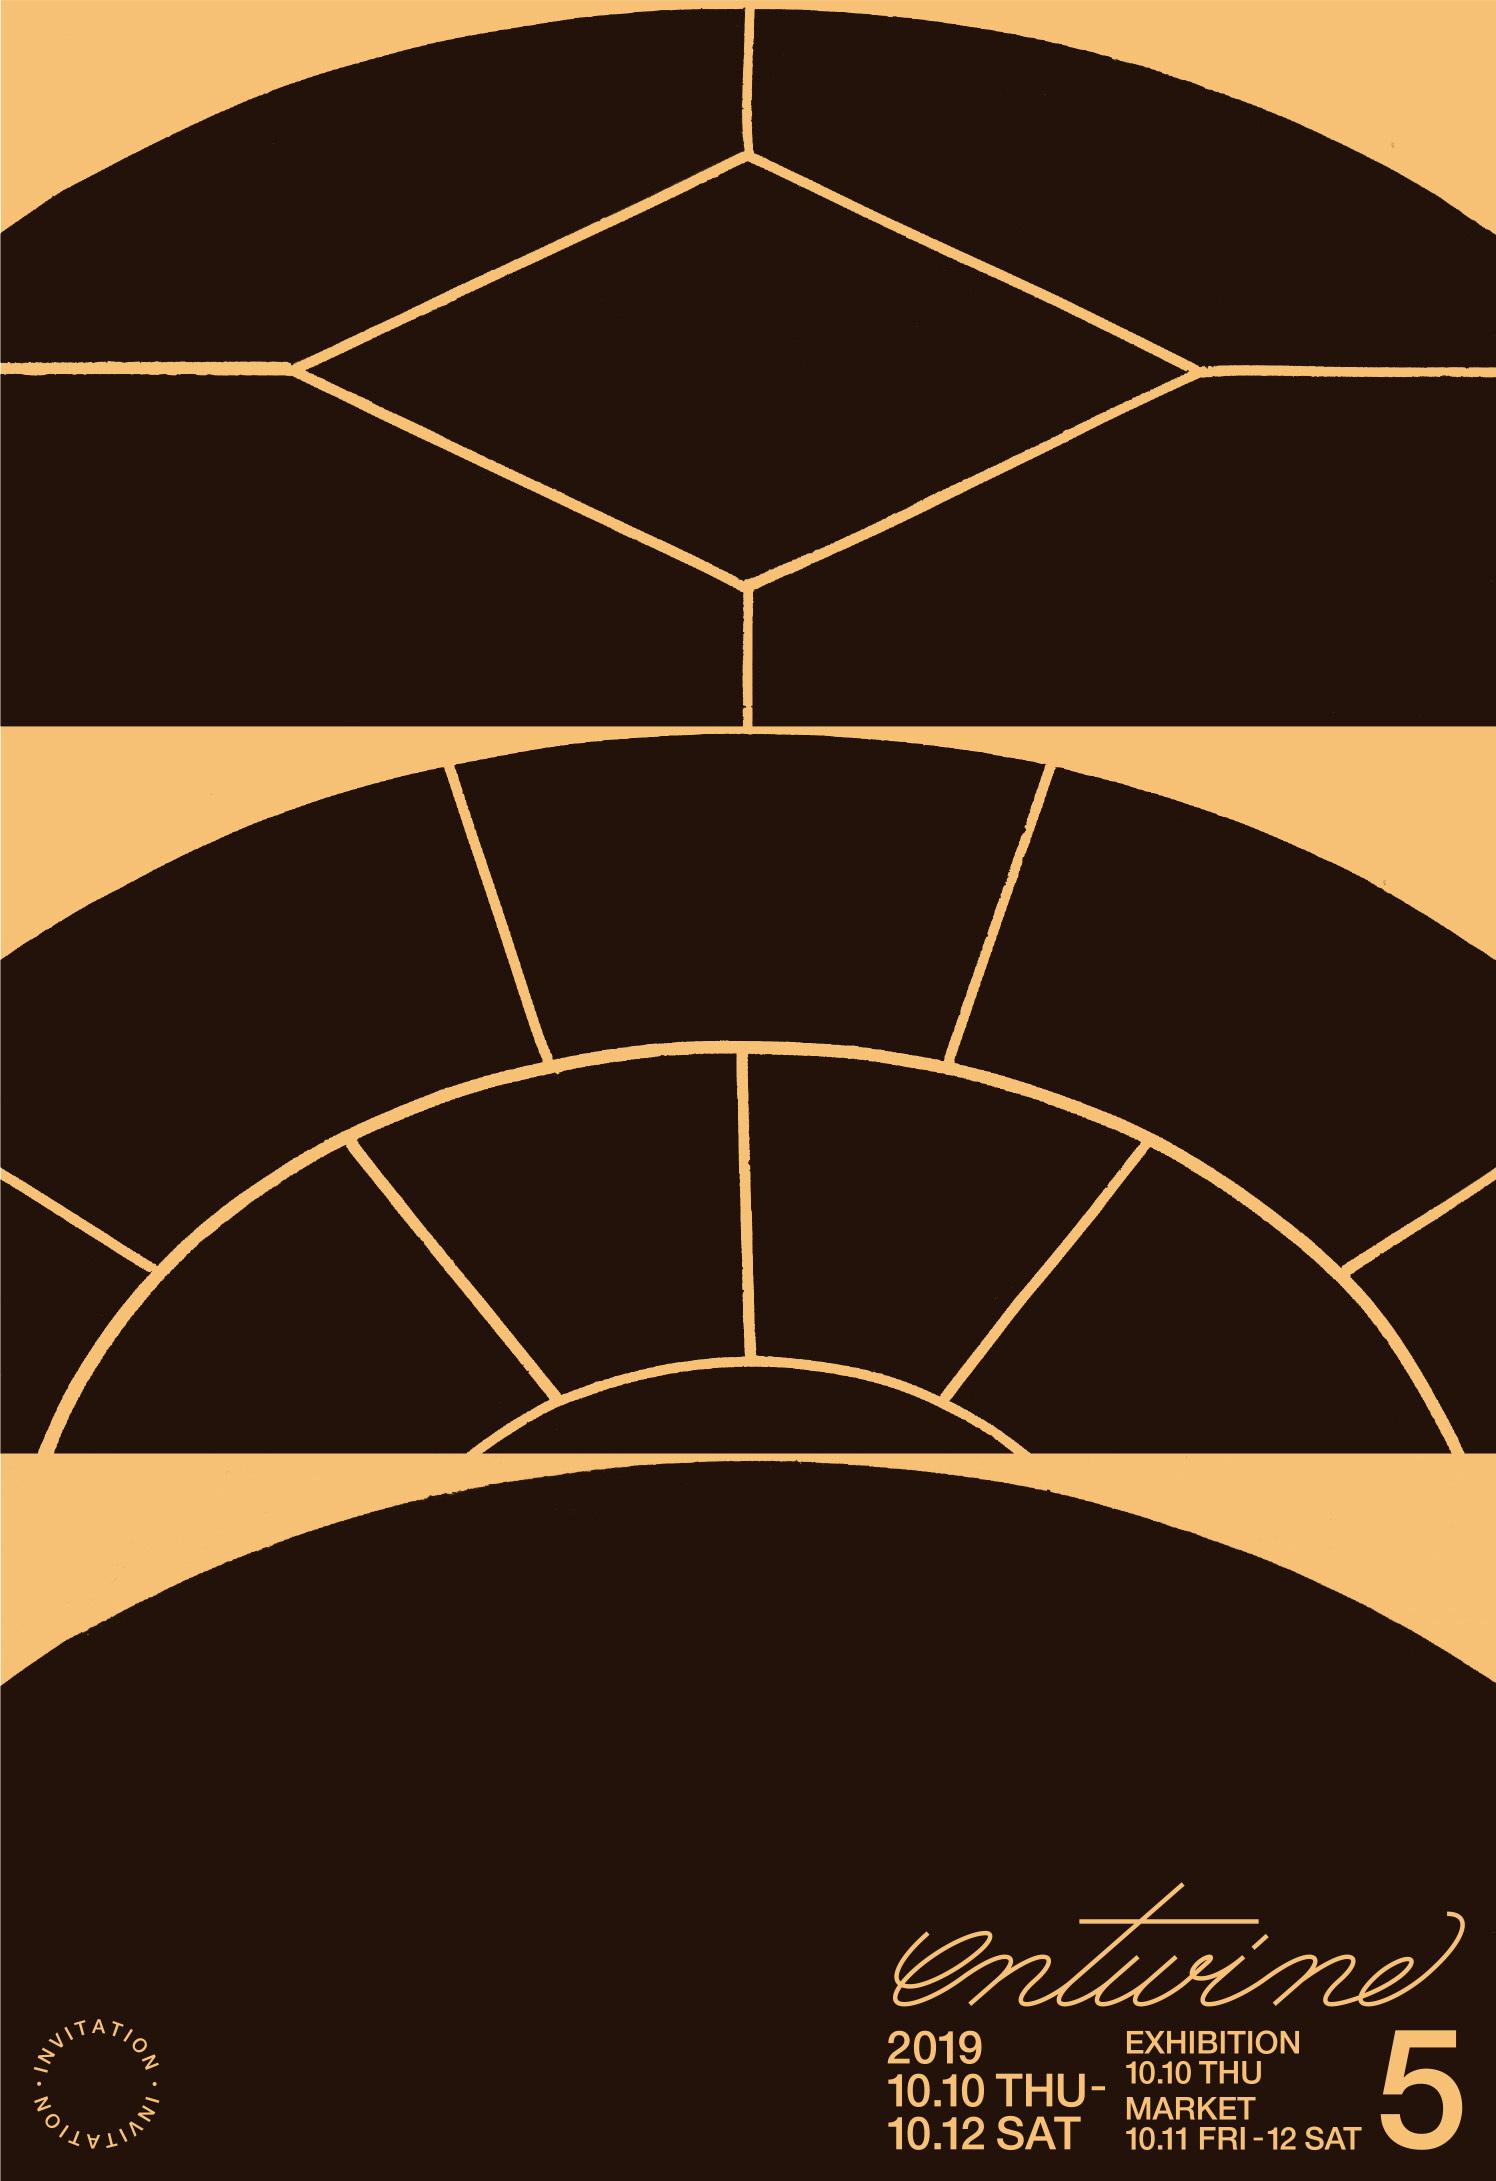 「entwine5 エントワイン5」出展のお知らせ_a0233551_10375486.jpg